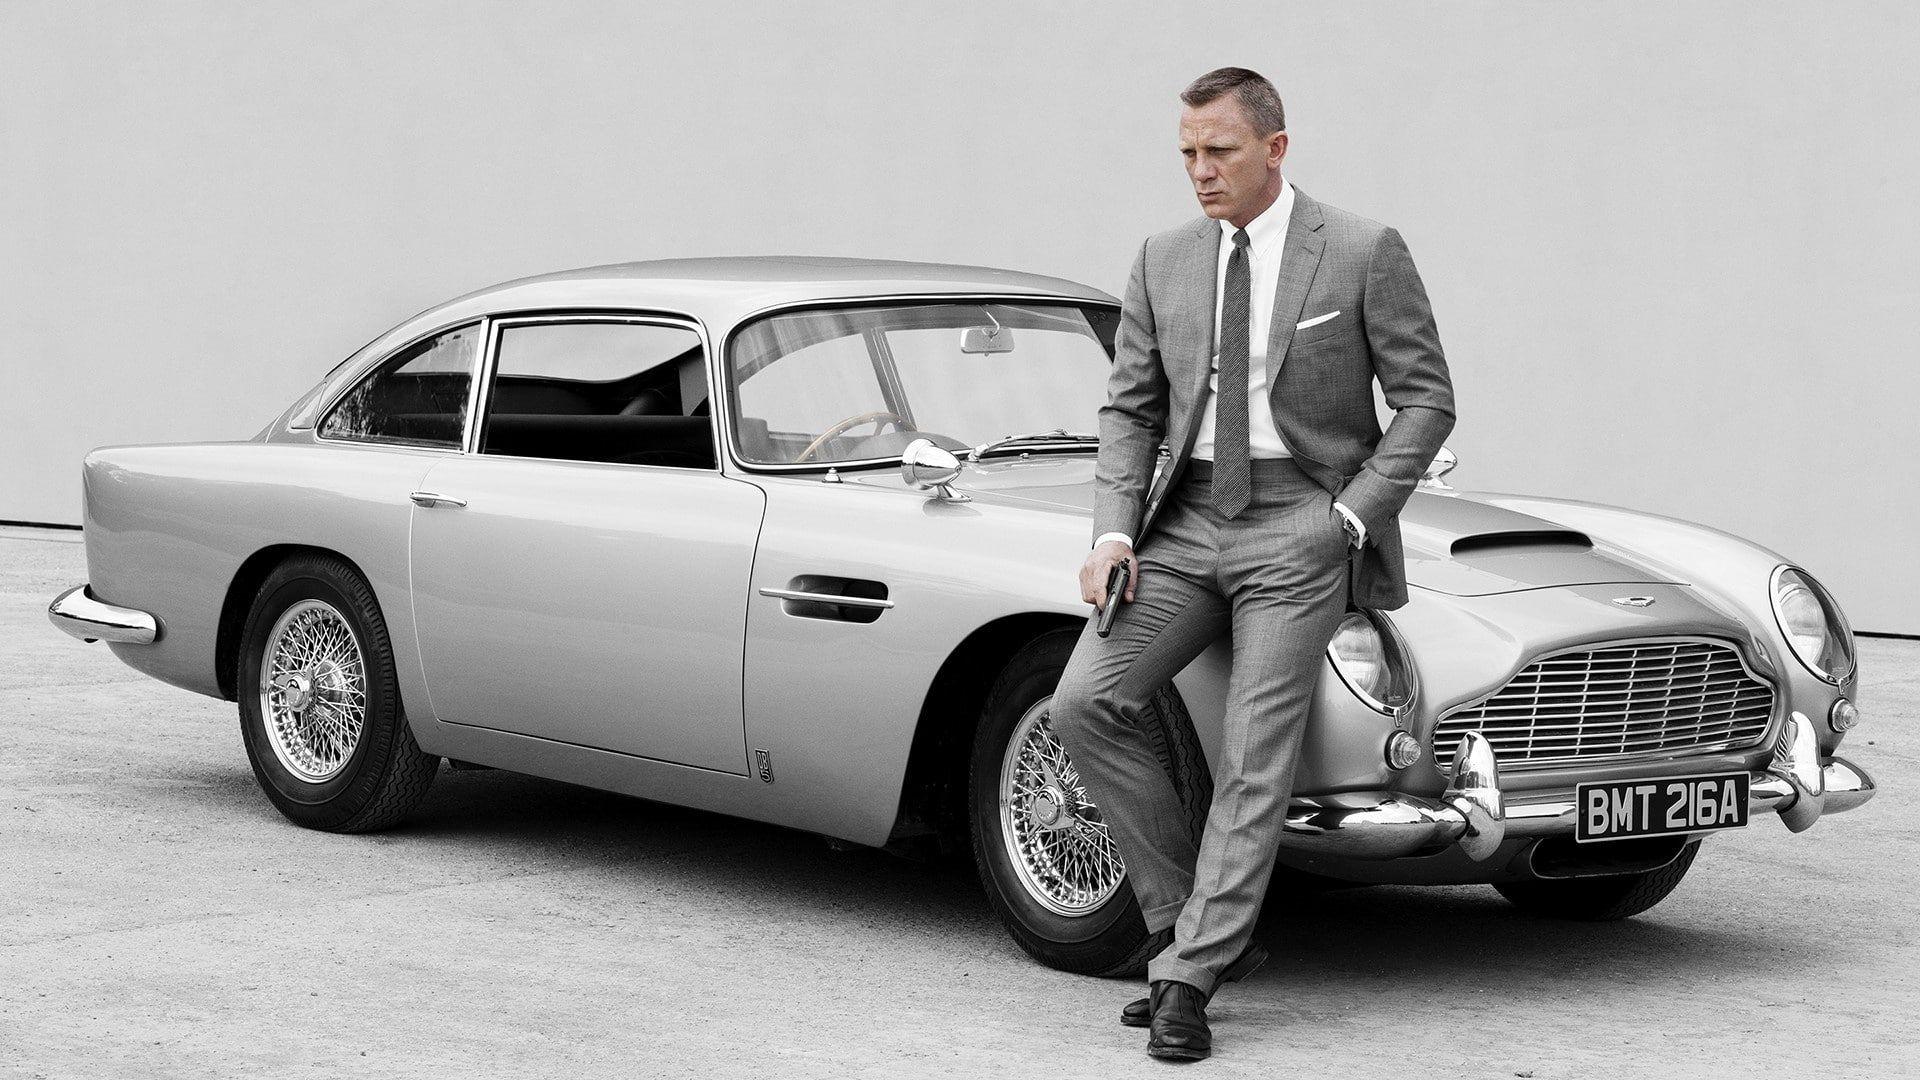 007 Actors Aston Bond Classic James Martin Movies People 1080p Wallpaper Hdwallpaper Desktop James Bond Aston Martin Db5 Bond Cars